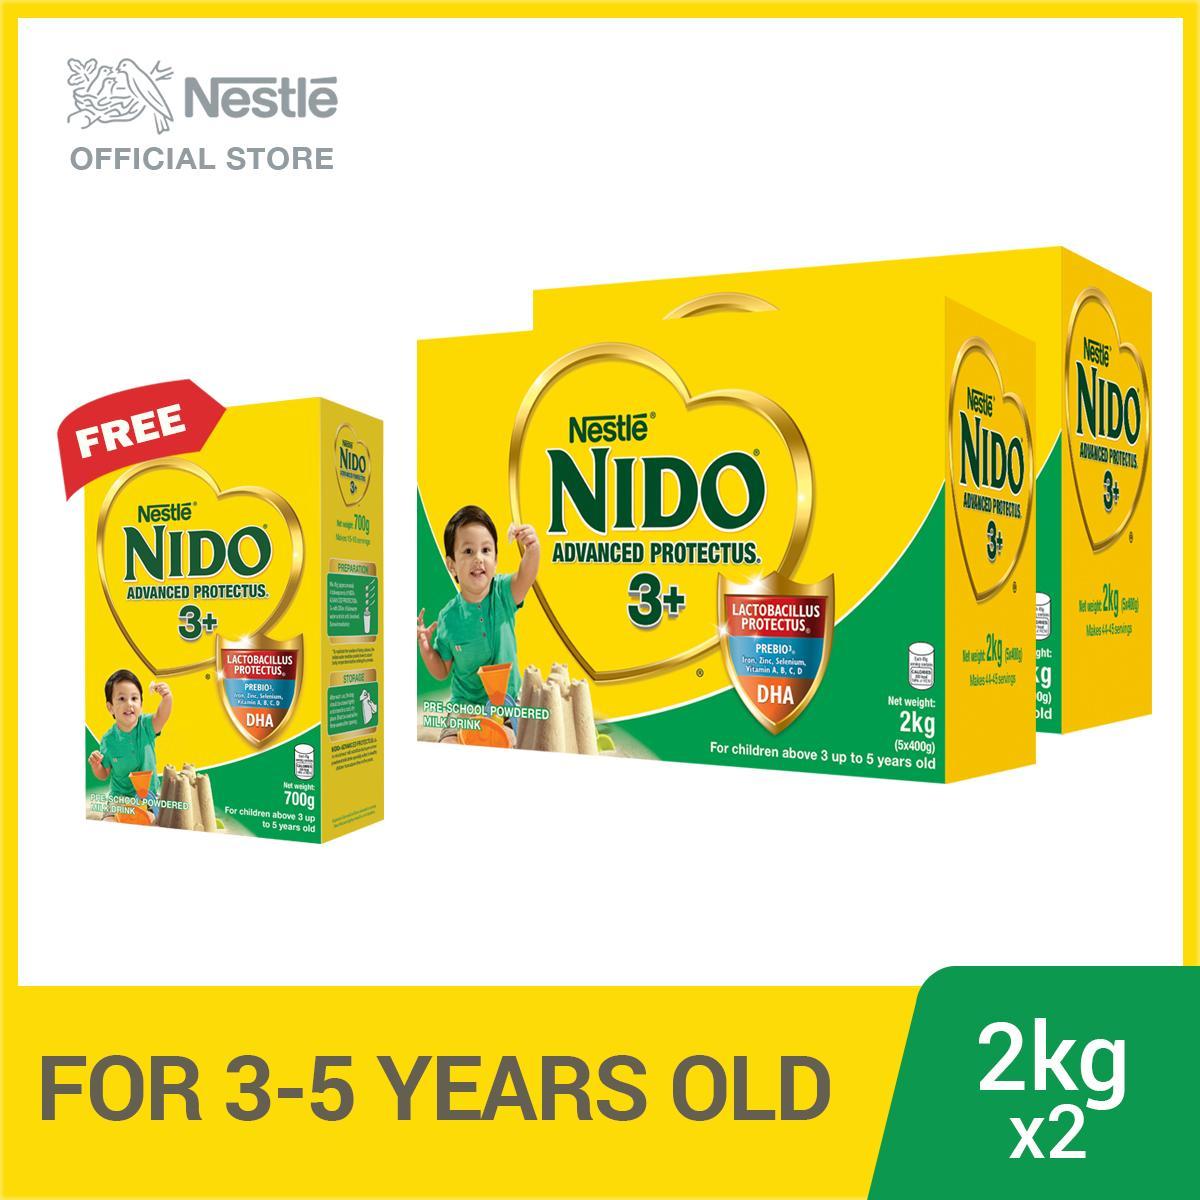 [PACK OF 2] NIDO 3+ Advanced Protectus 2kg, FREE NIDO 3+ 700g